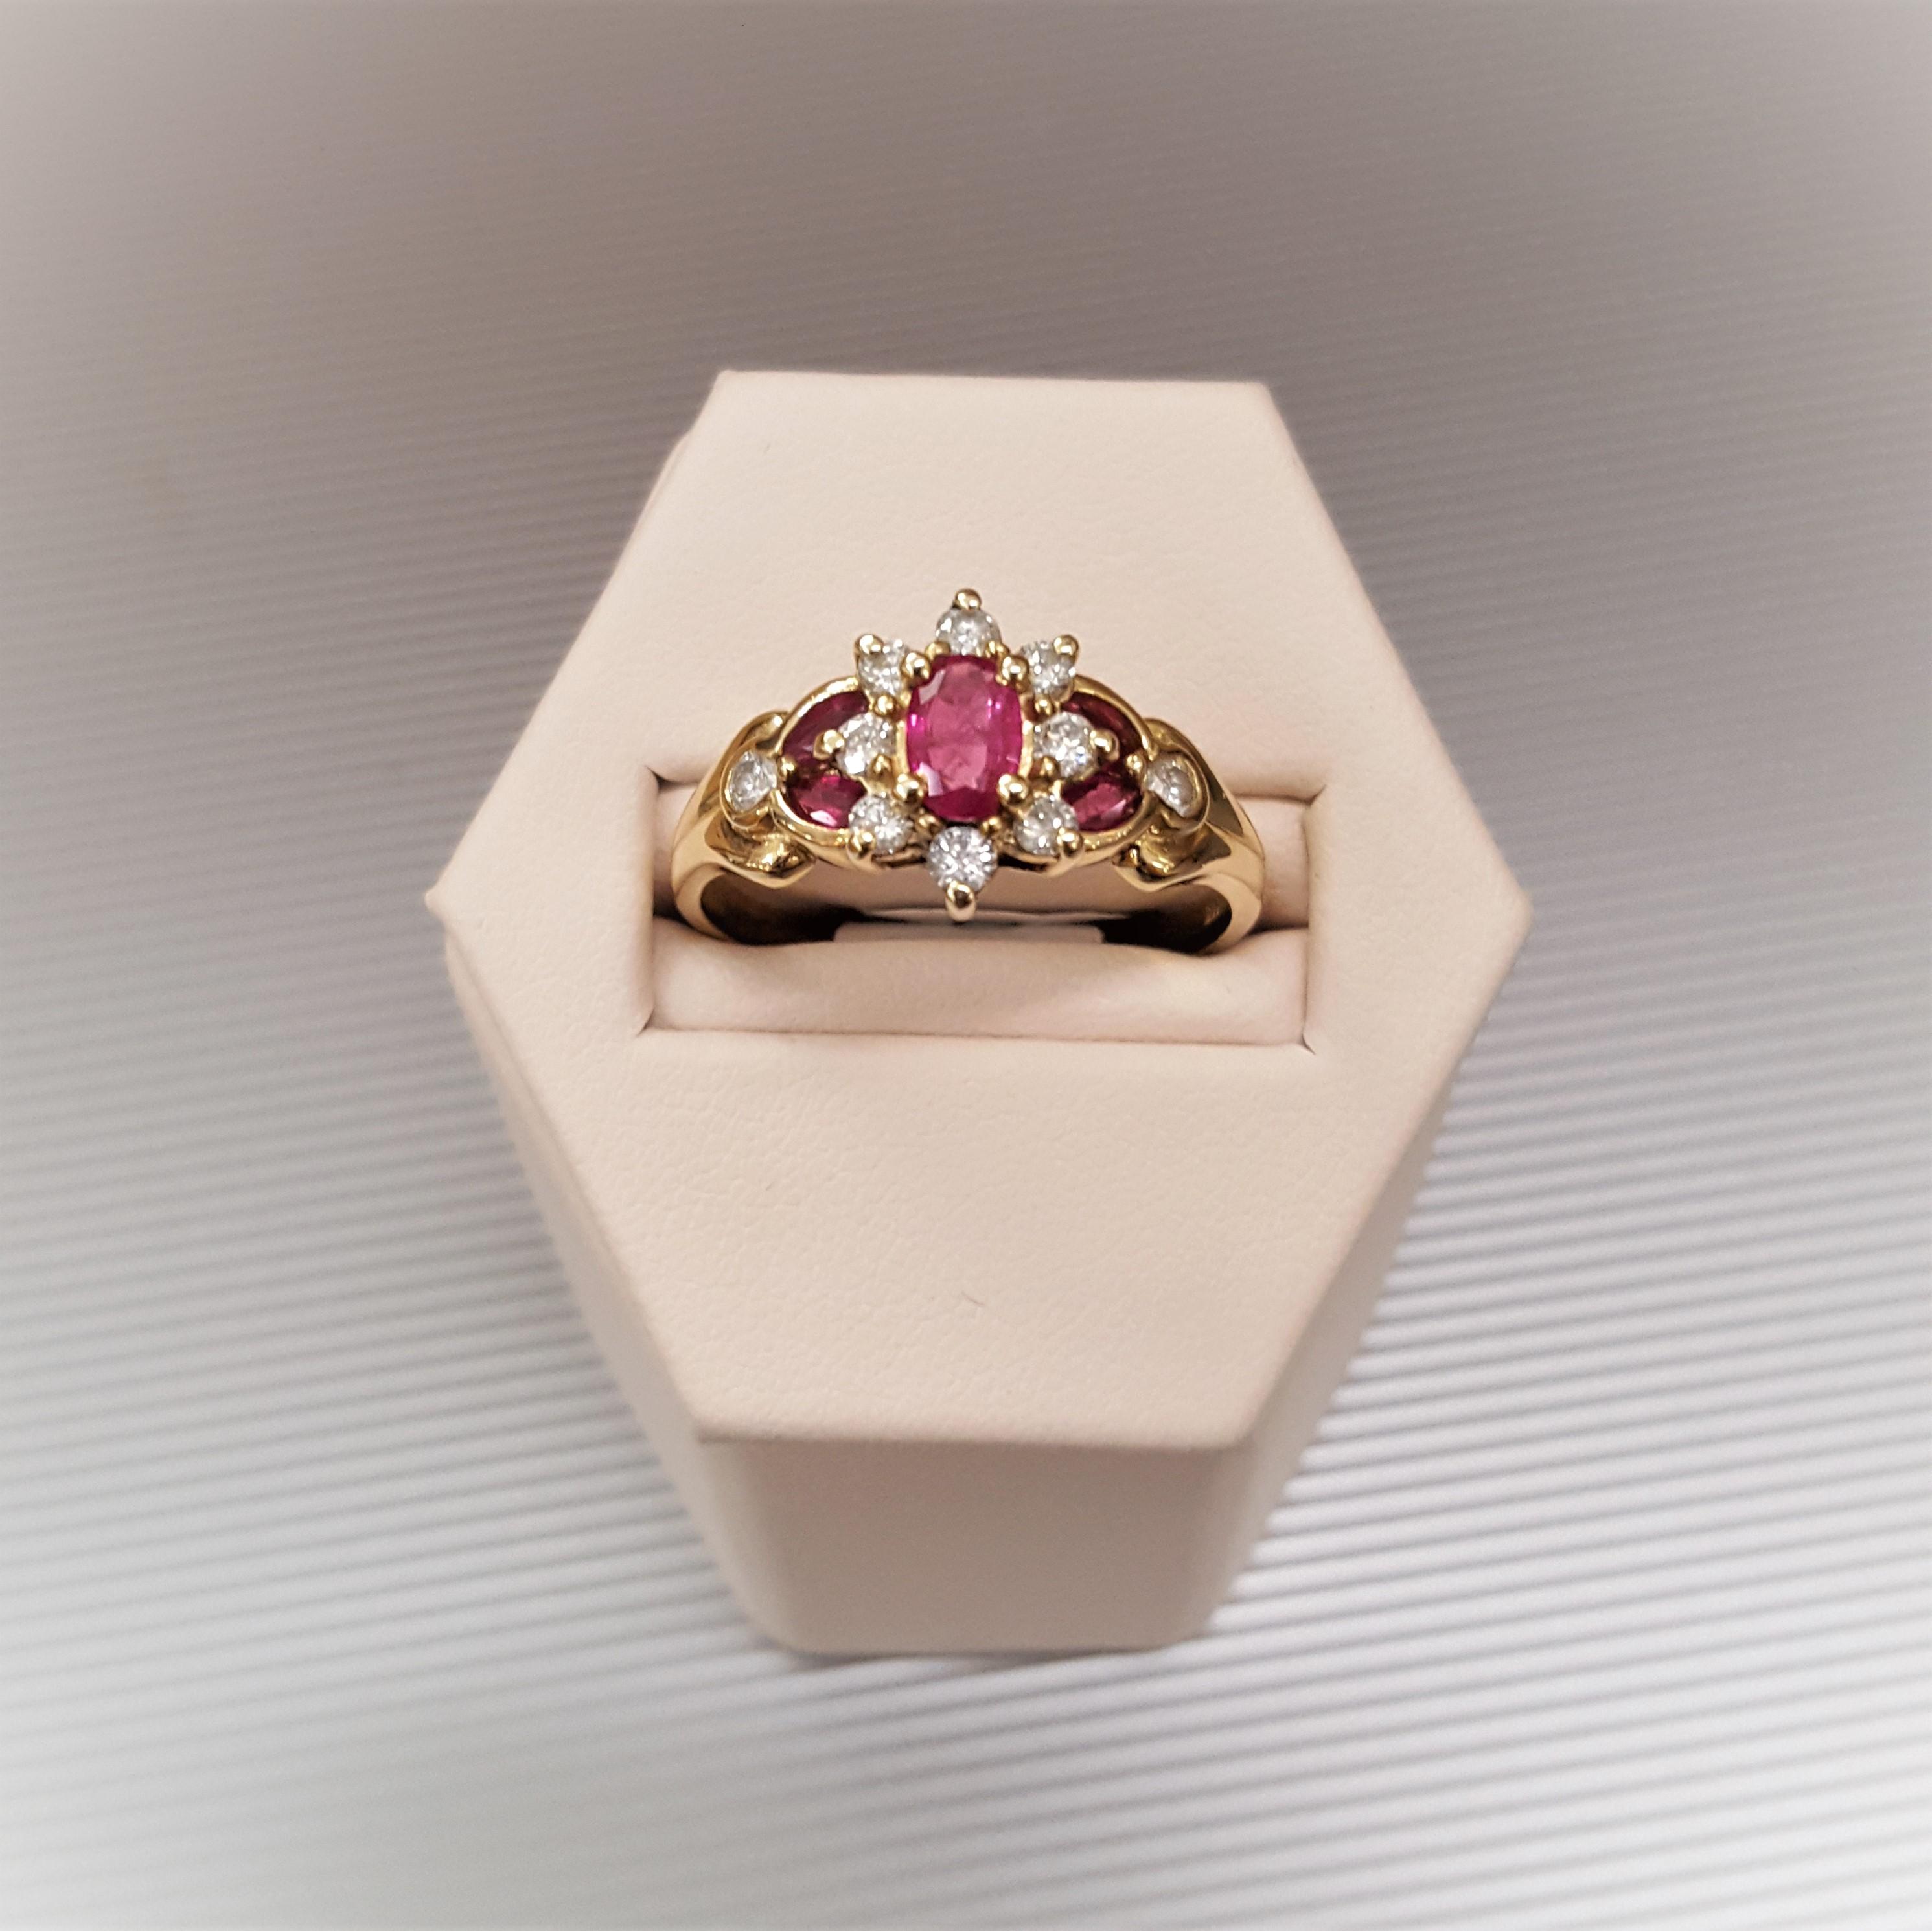 1.50ctw Rubies & .25ctw Diamonds